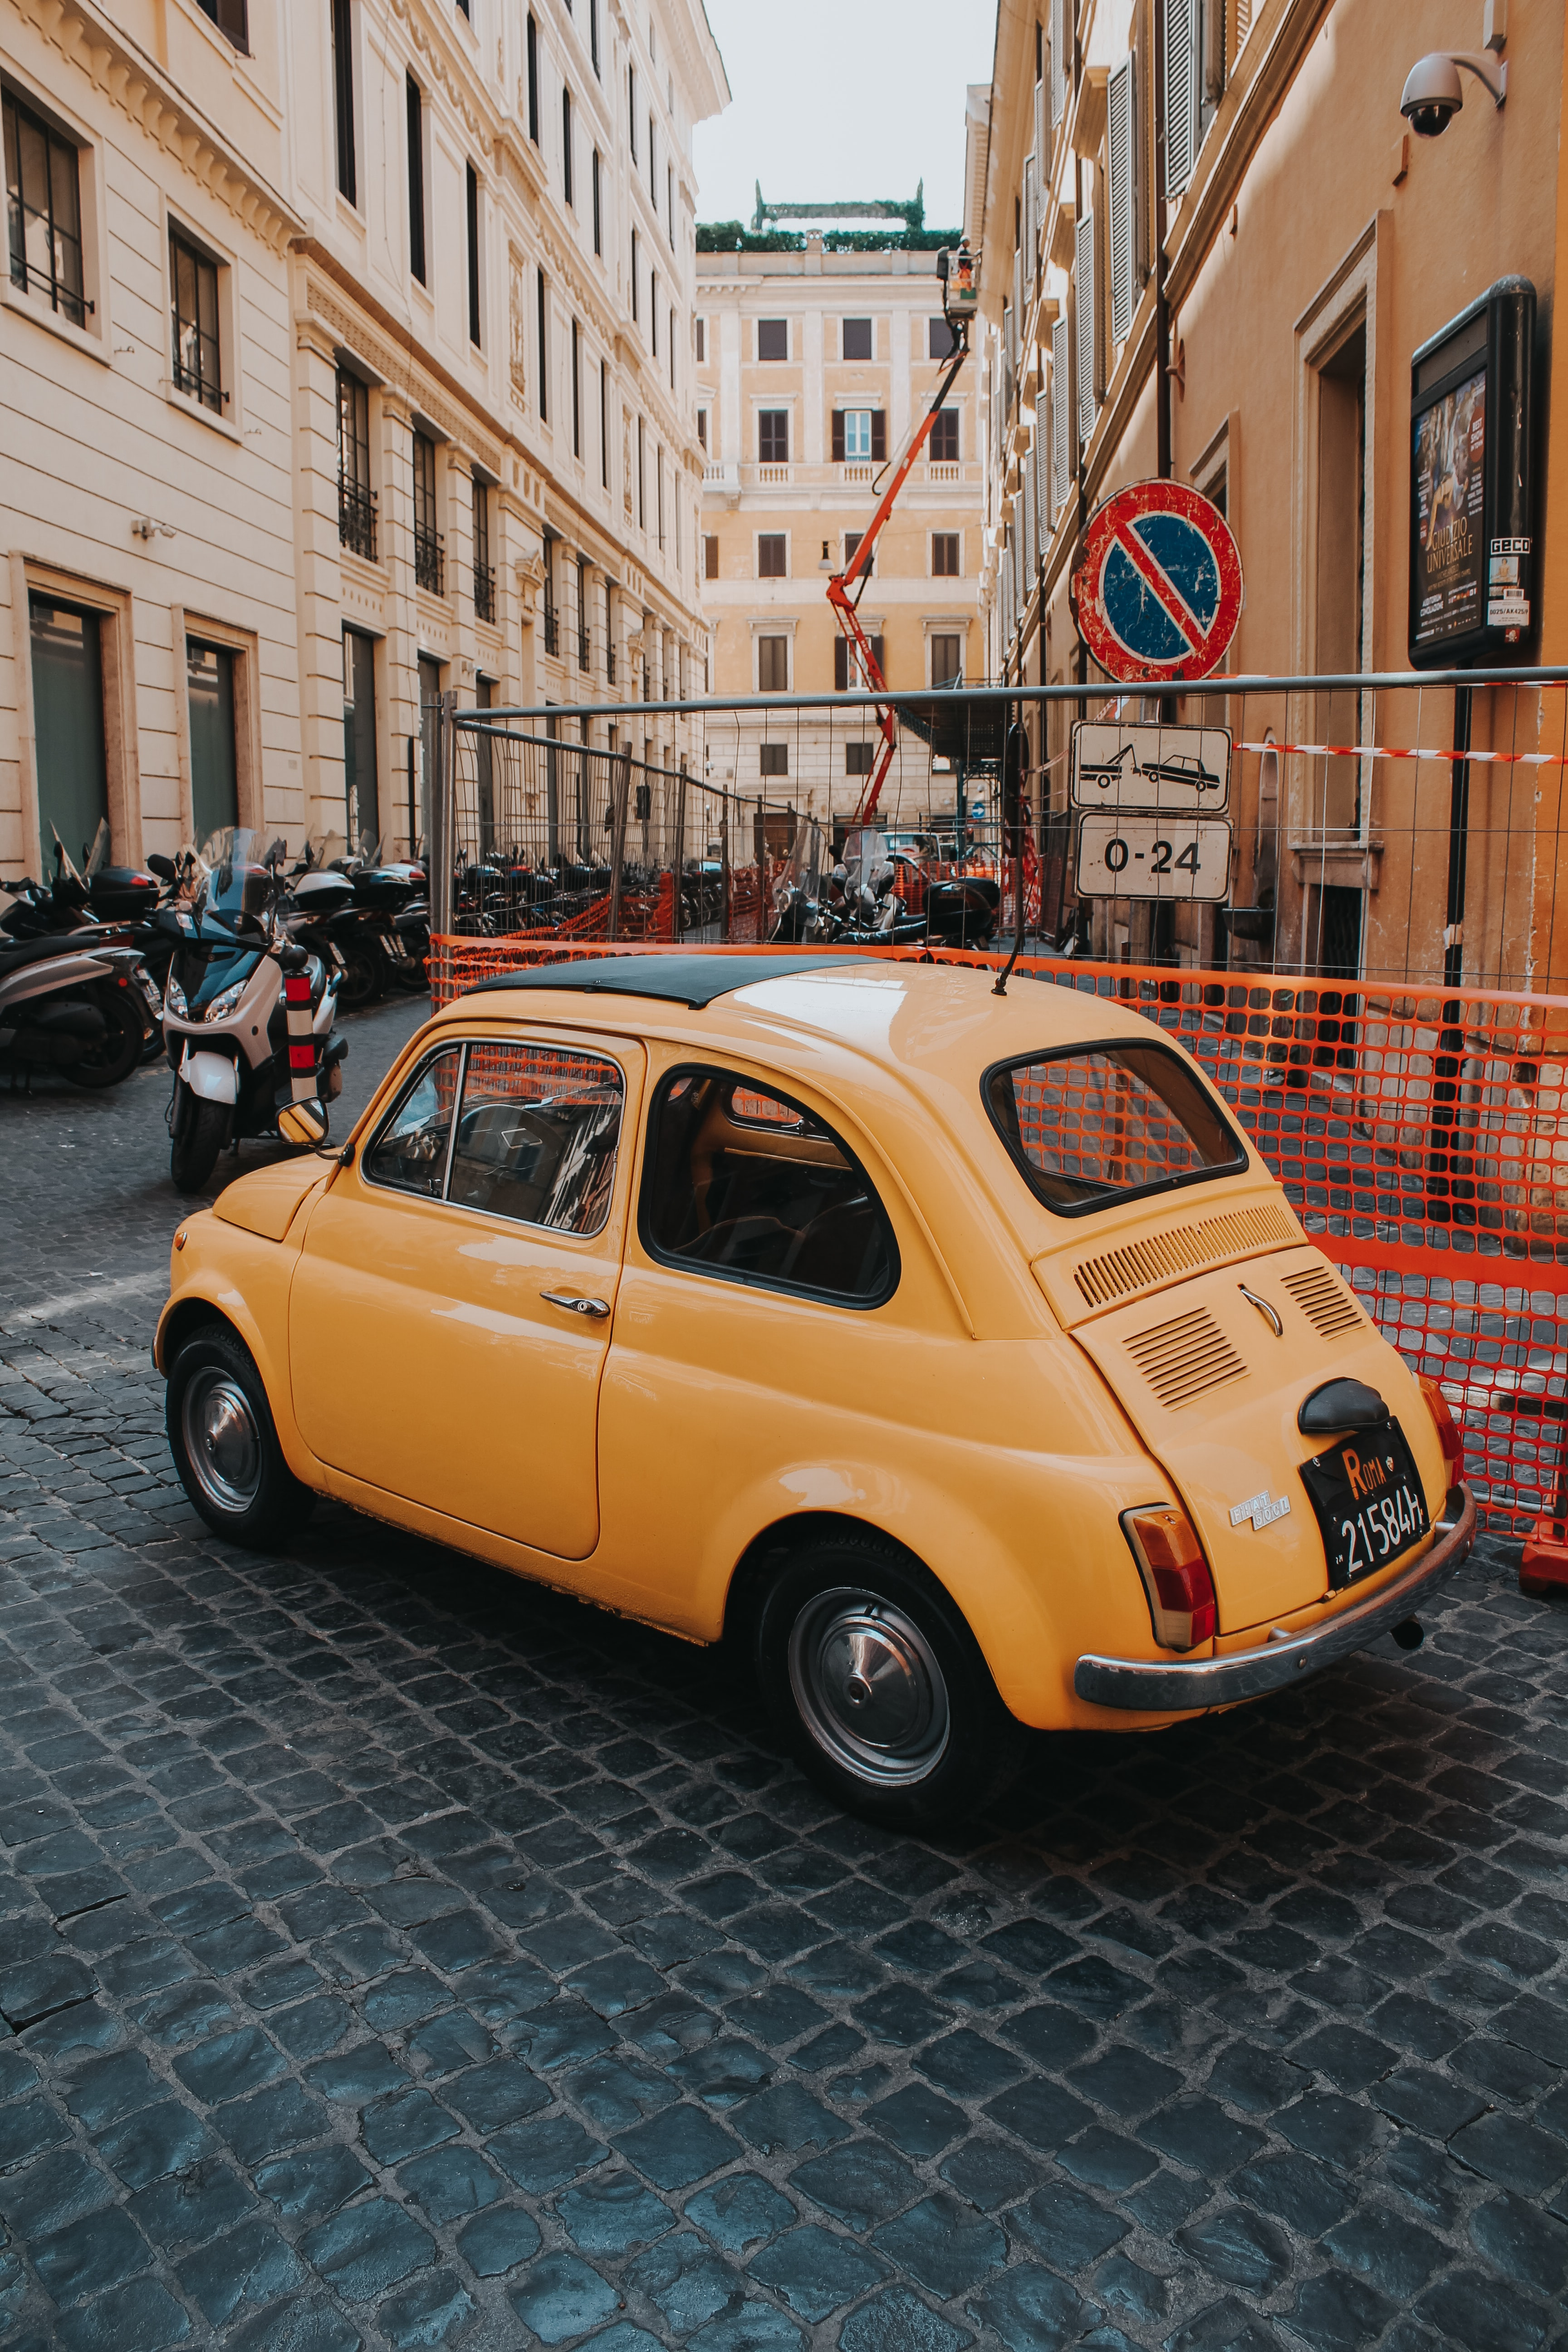 orange beetle-style car parked near building